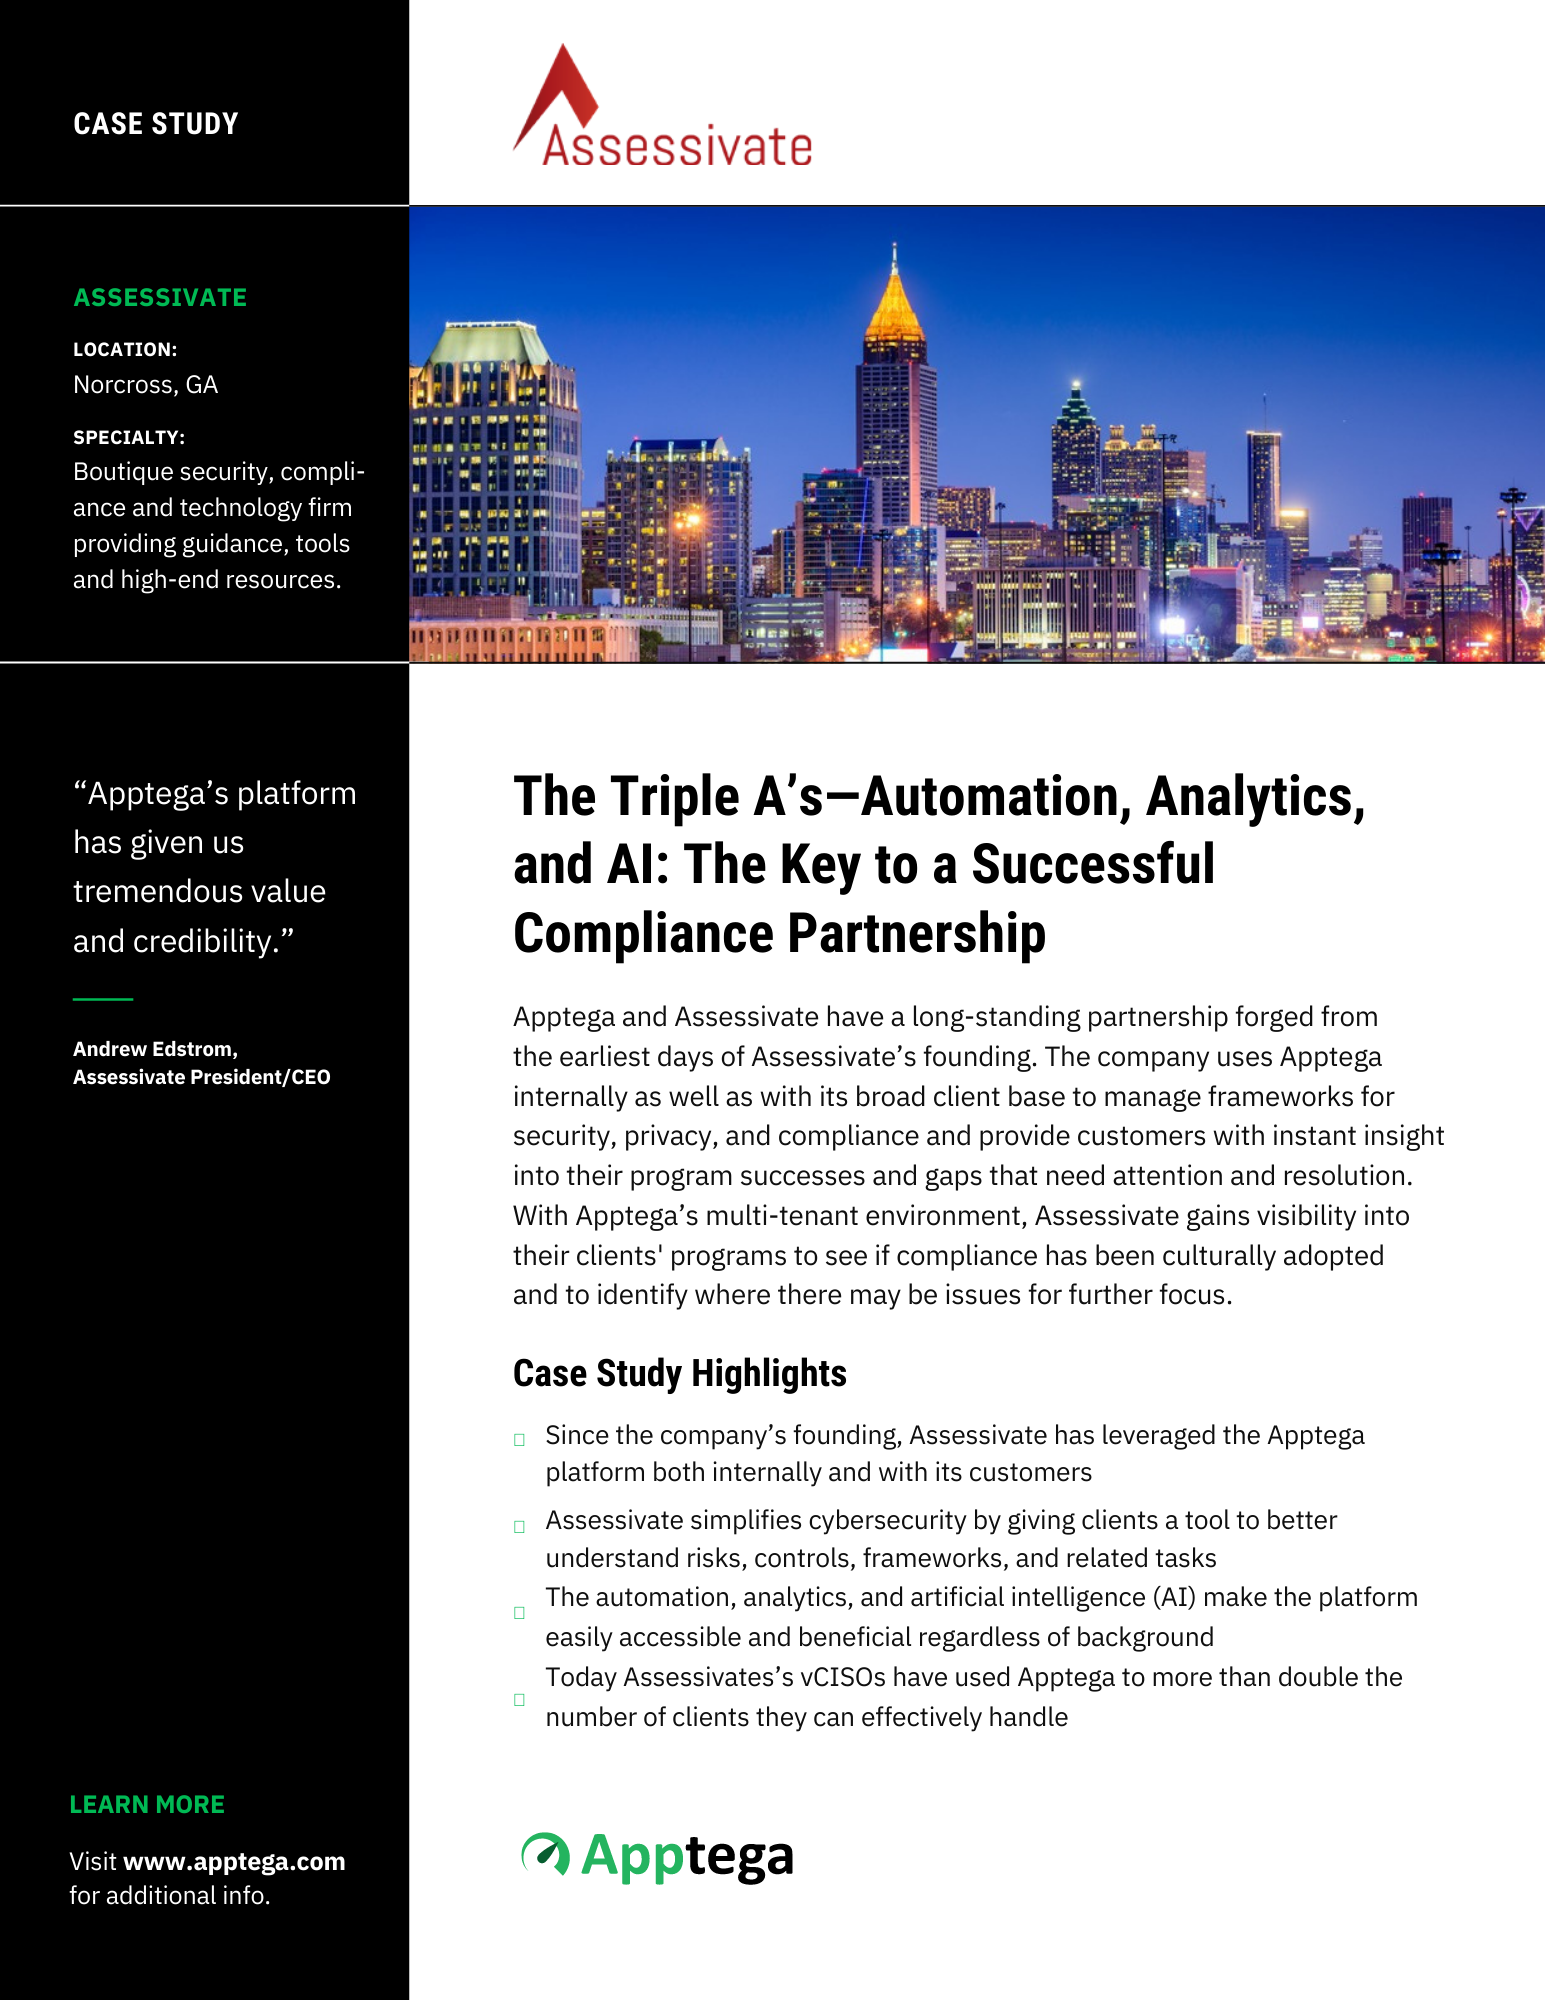 Assessivate-Case-Study-101221.pdf